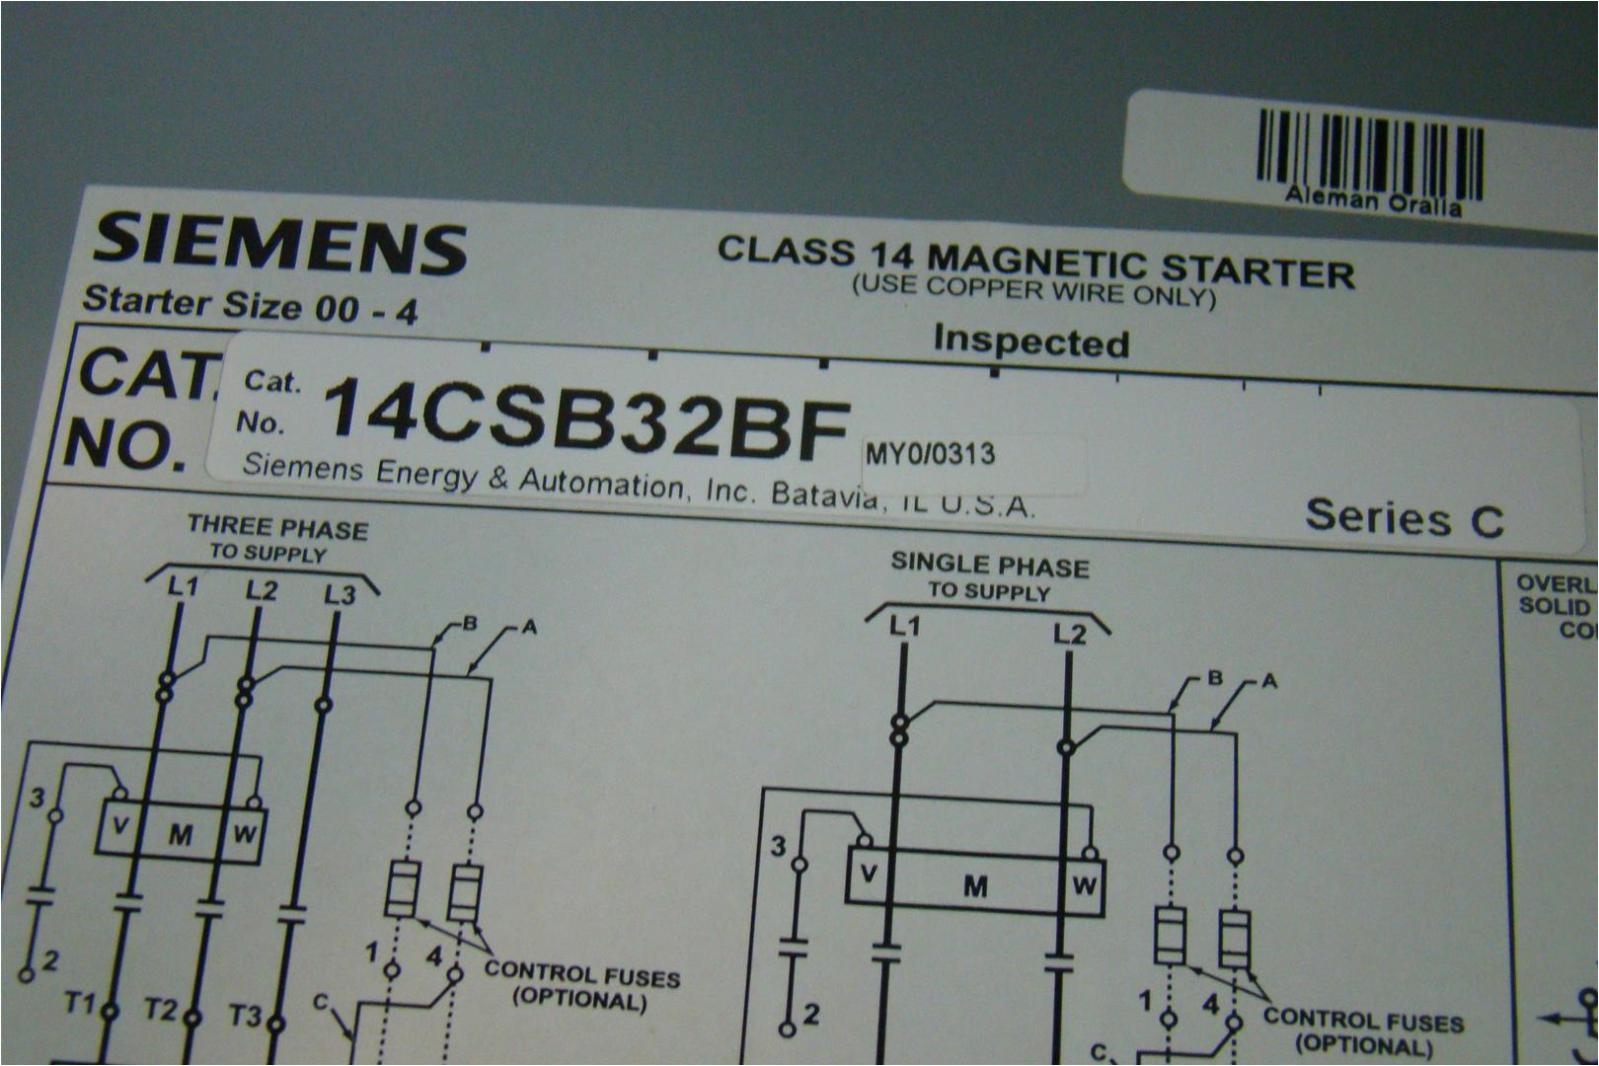 age164 siemens heavy duty motor starter class 14 magnetic starter 3ph 200 230vac maxamp18 48asb3m20 1 5 jpg